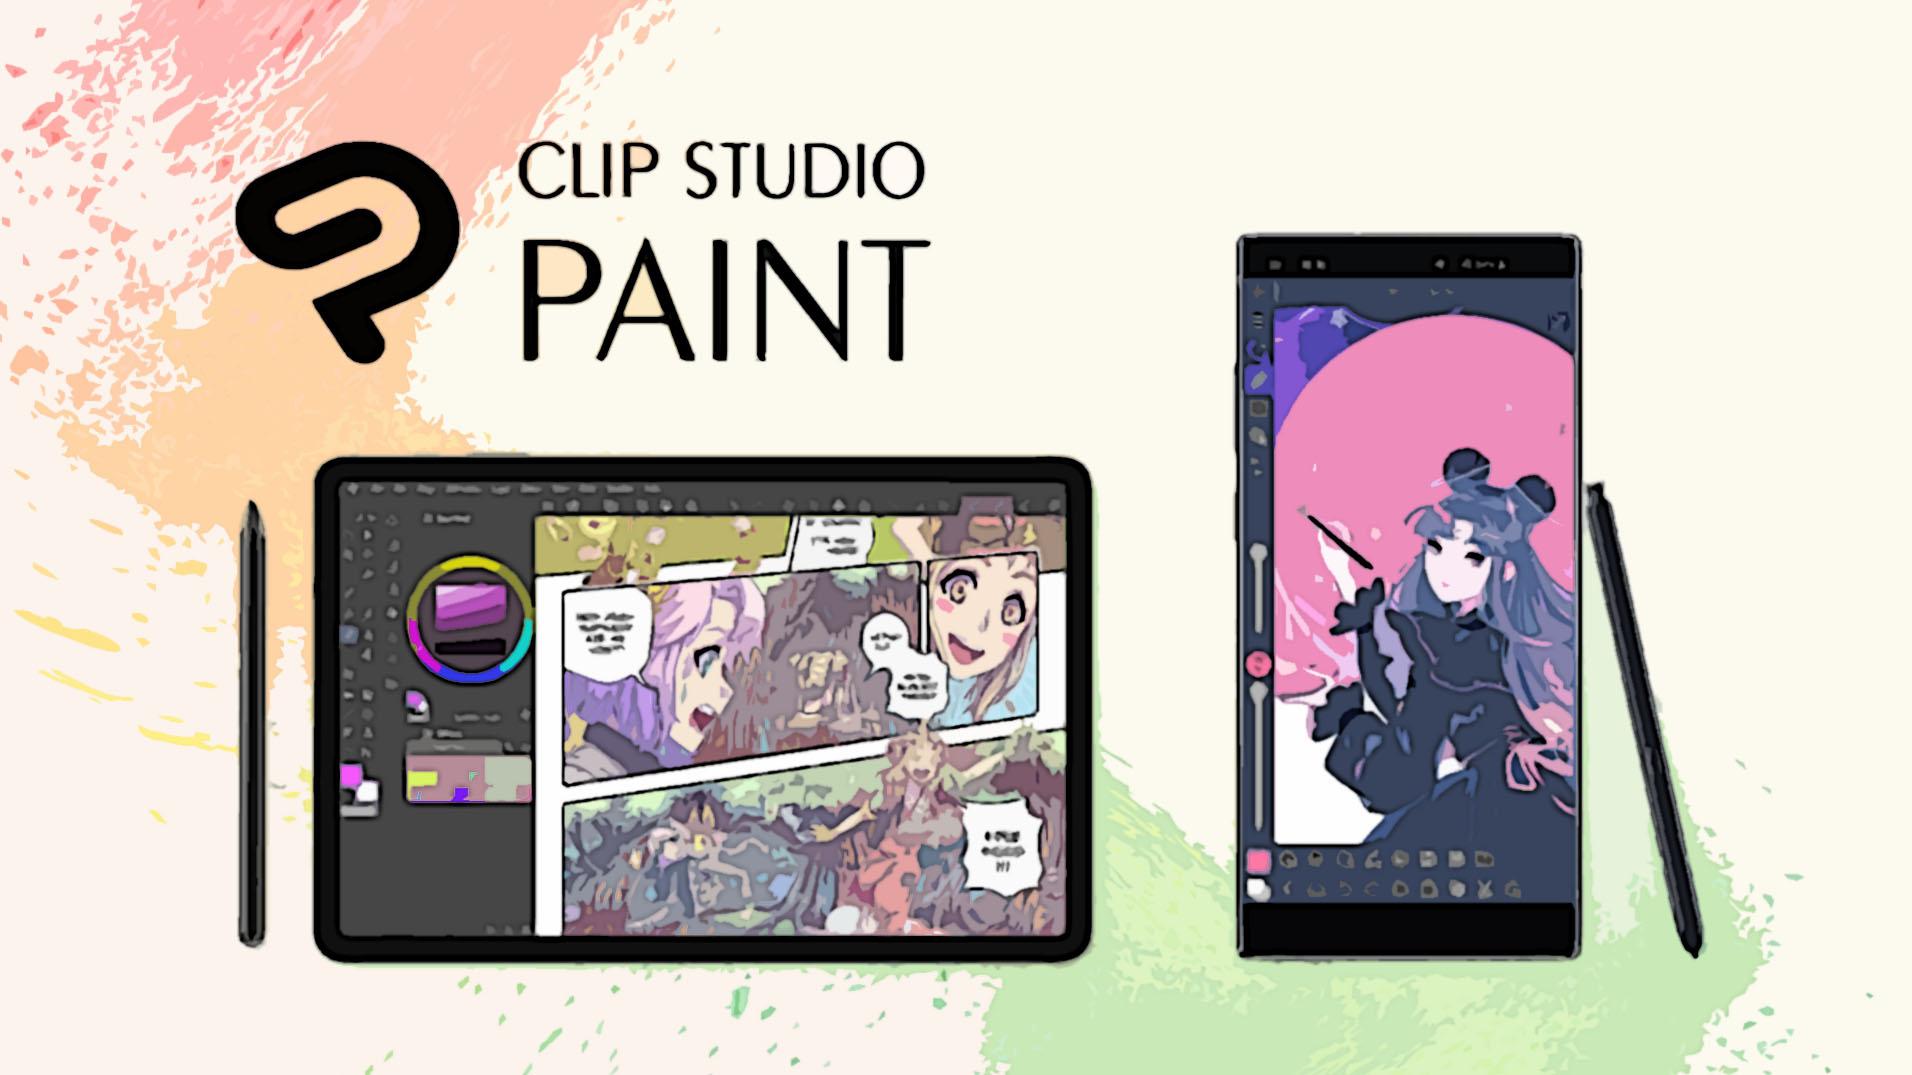 Clip Studio Paint 2021 Crack